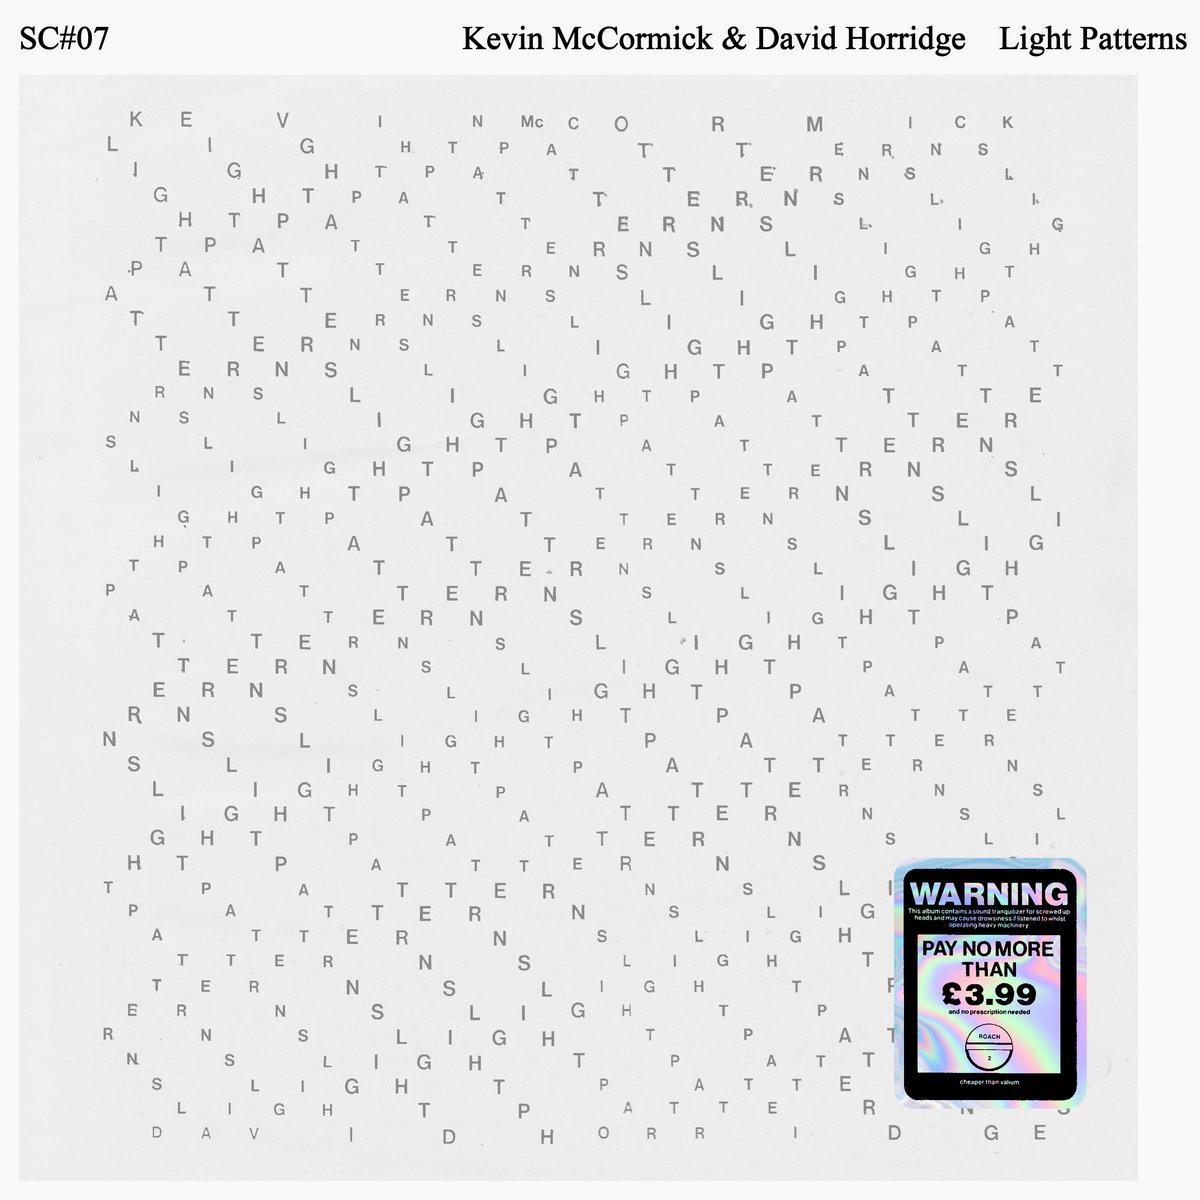 Kevin McCormick And David Horridge : Light Patterns